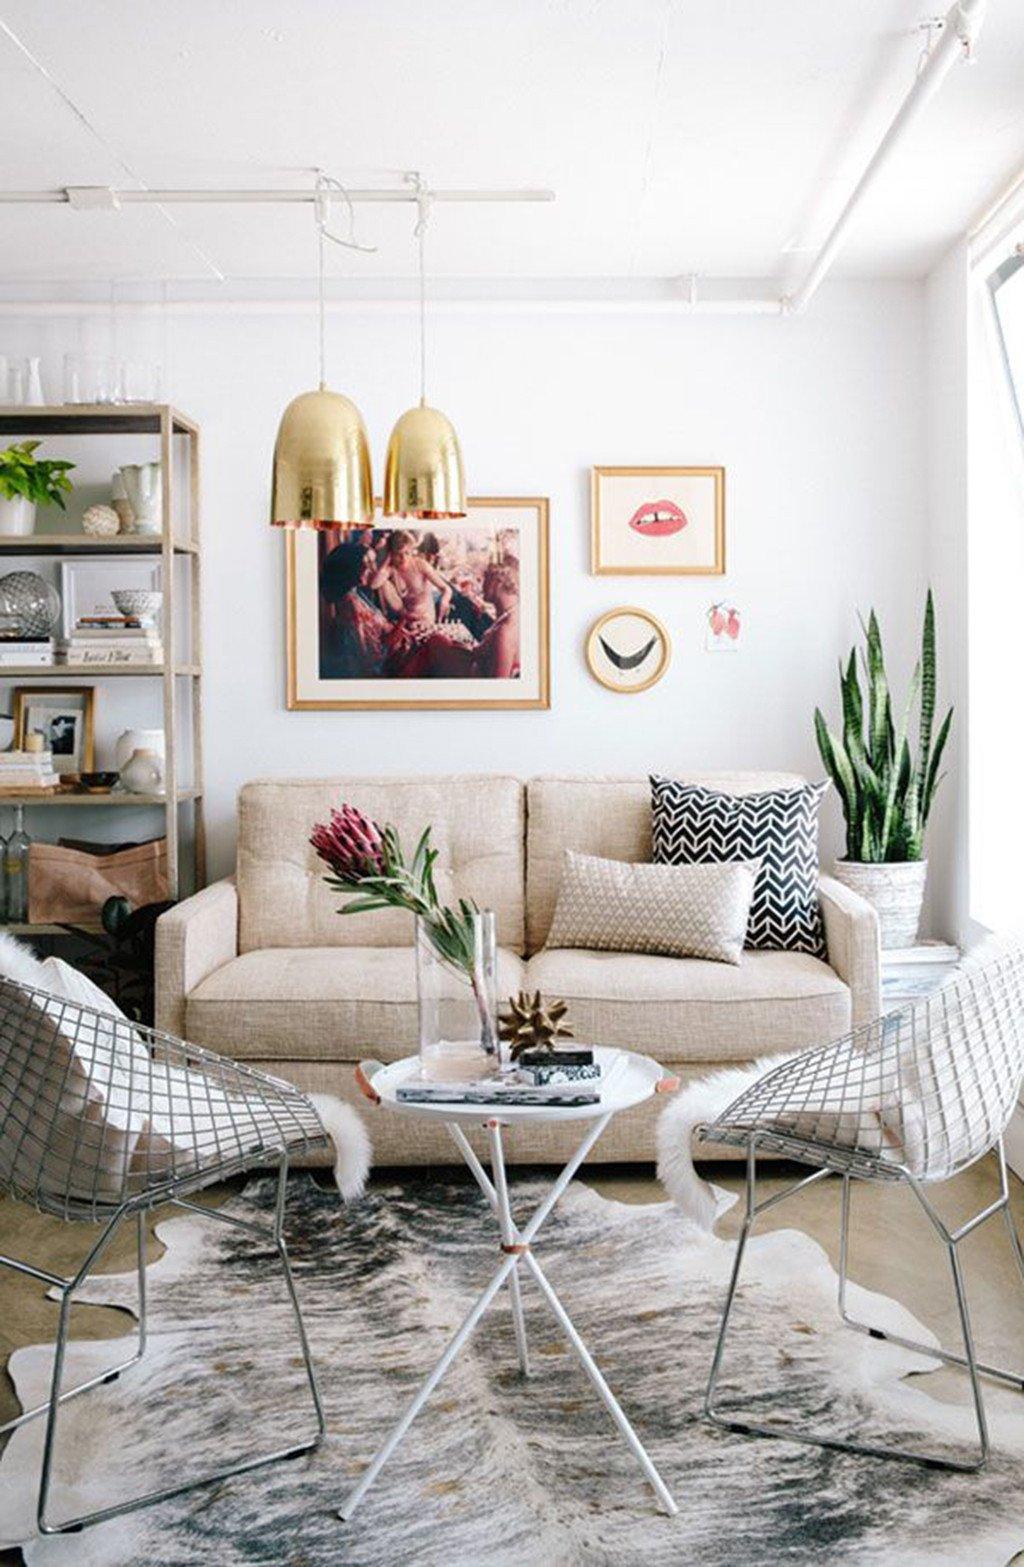 Small Living Room Decor Ideas 50 Best Small Living Room Design Ideas for 2017